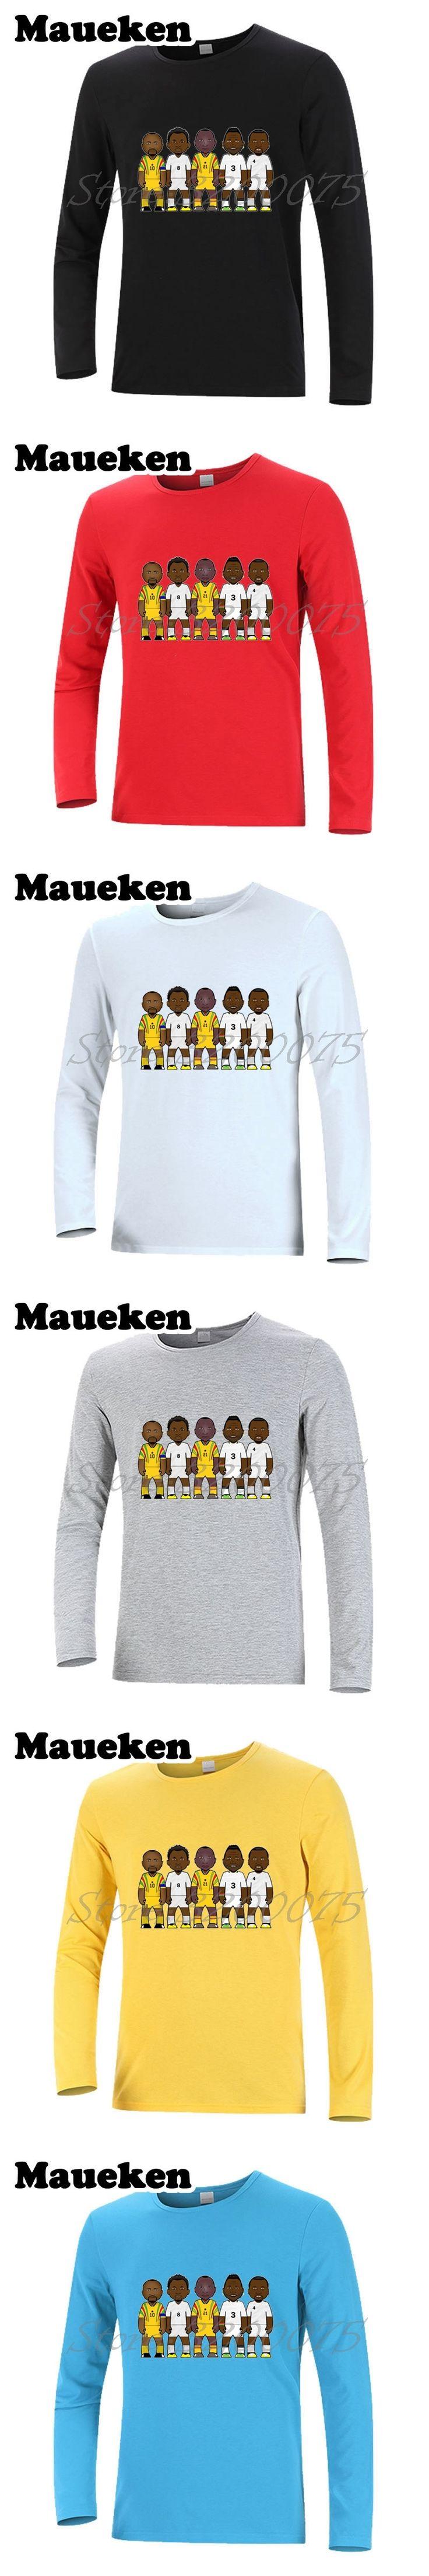 Men's Long Sleeve Legends Ghana Abedi Pele Samuel Kuffour Tony Yeboah Asamoah Gyan Michael Essien T-Shirt W17080618